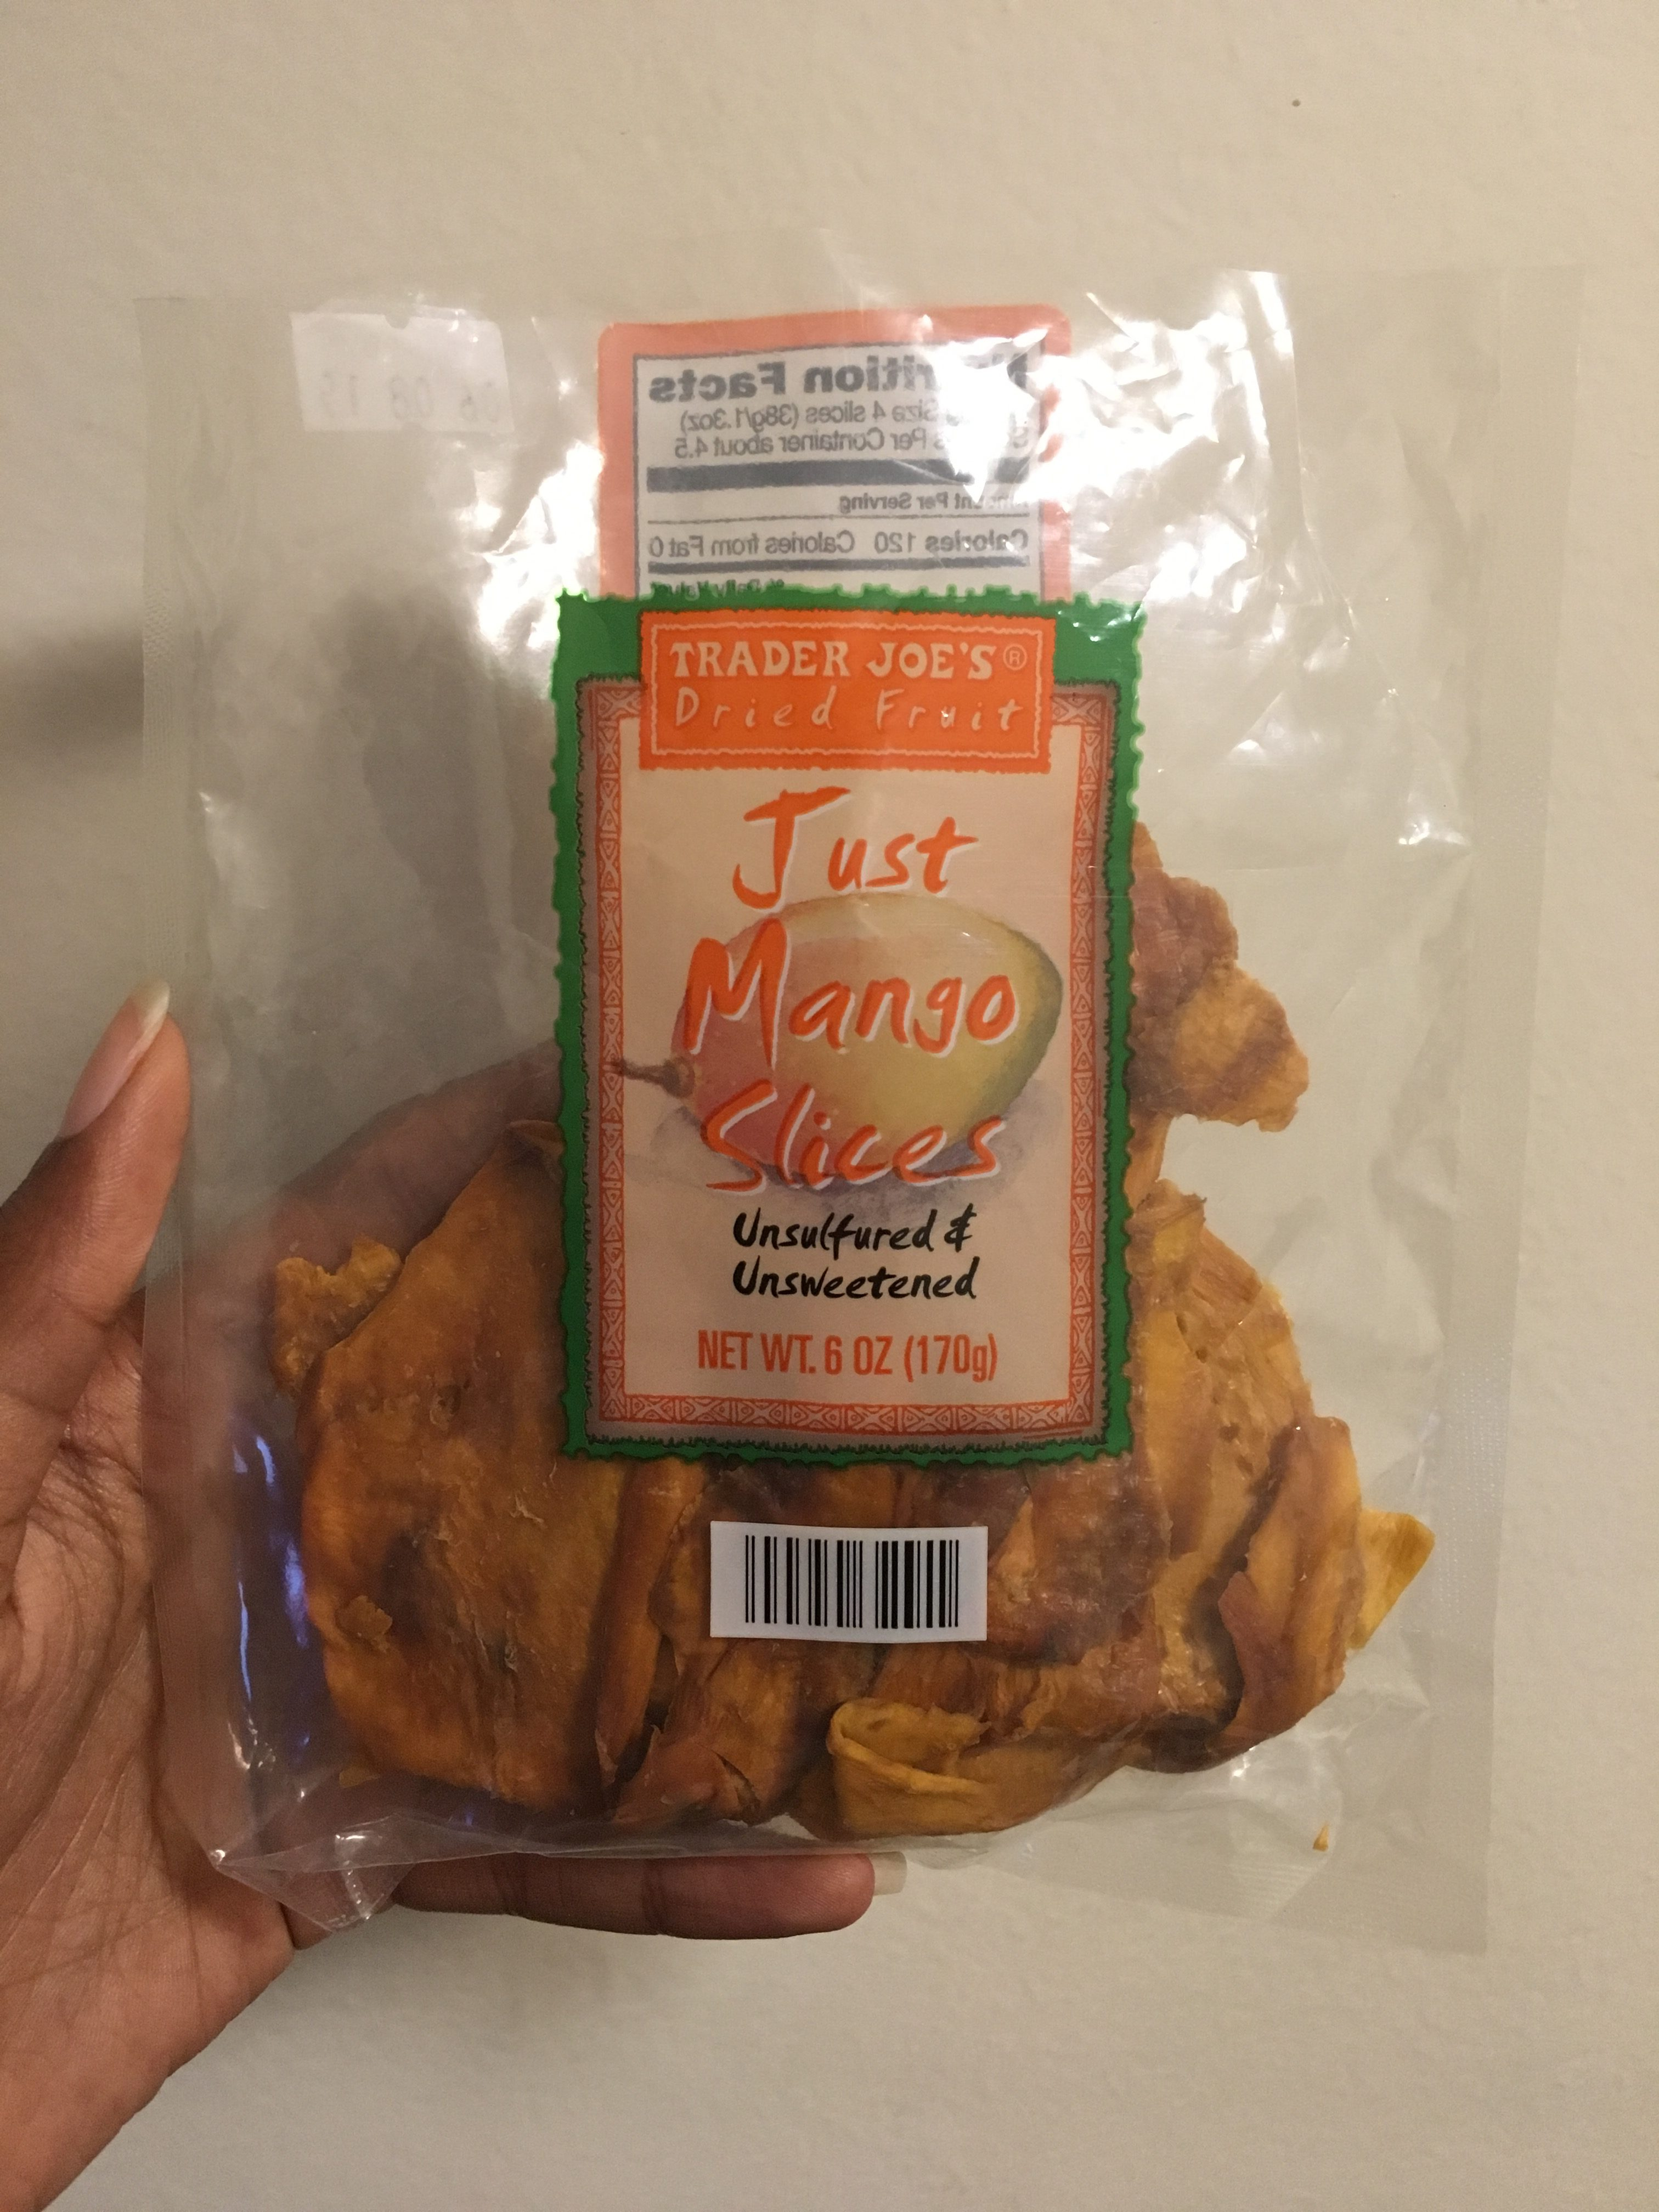 Trader Joes Just Mango Slices